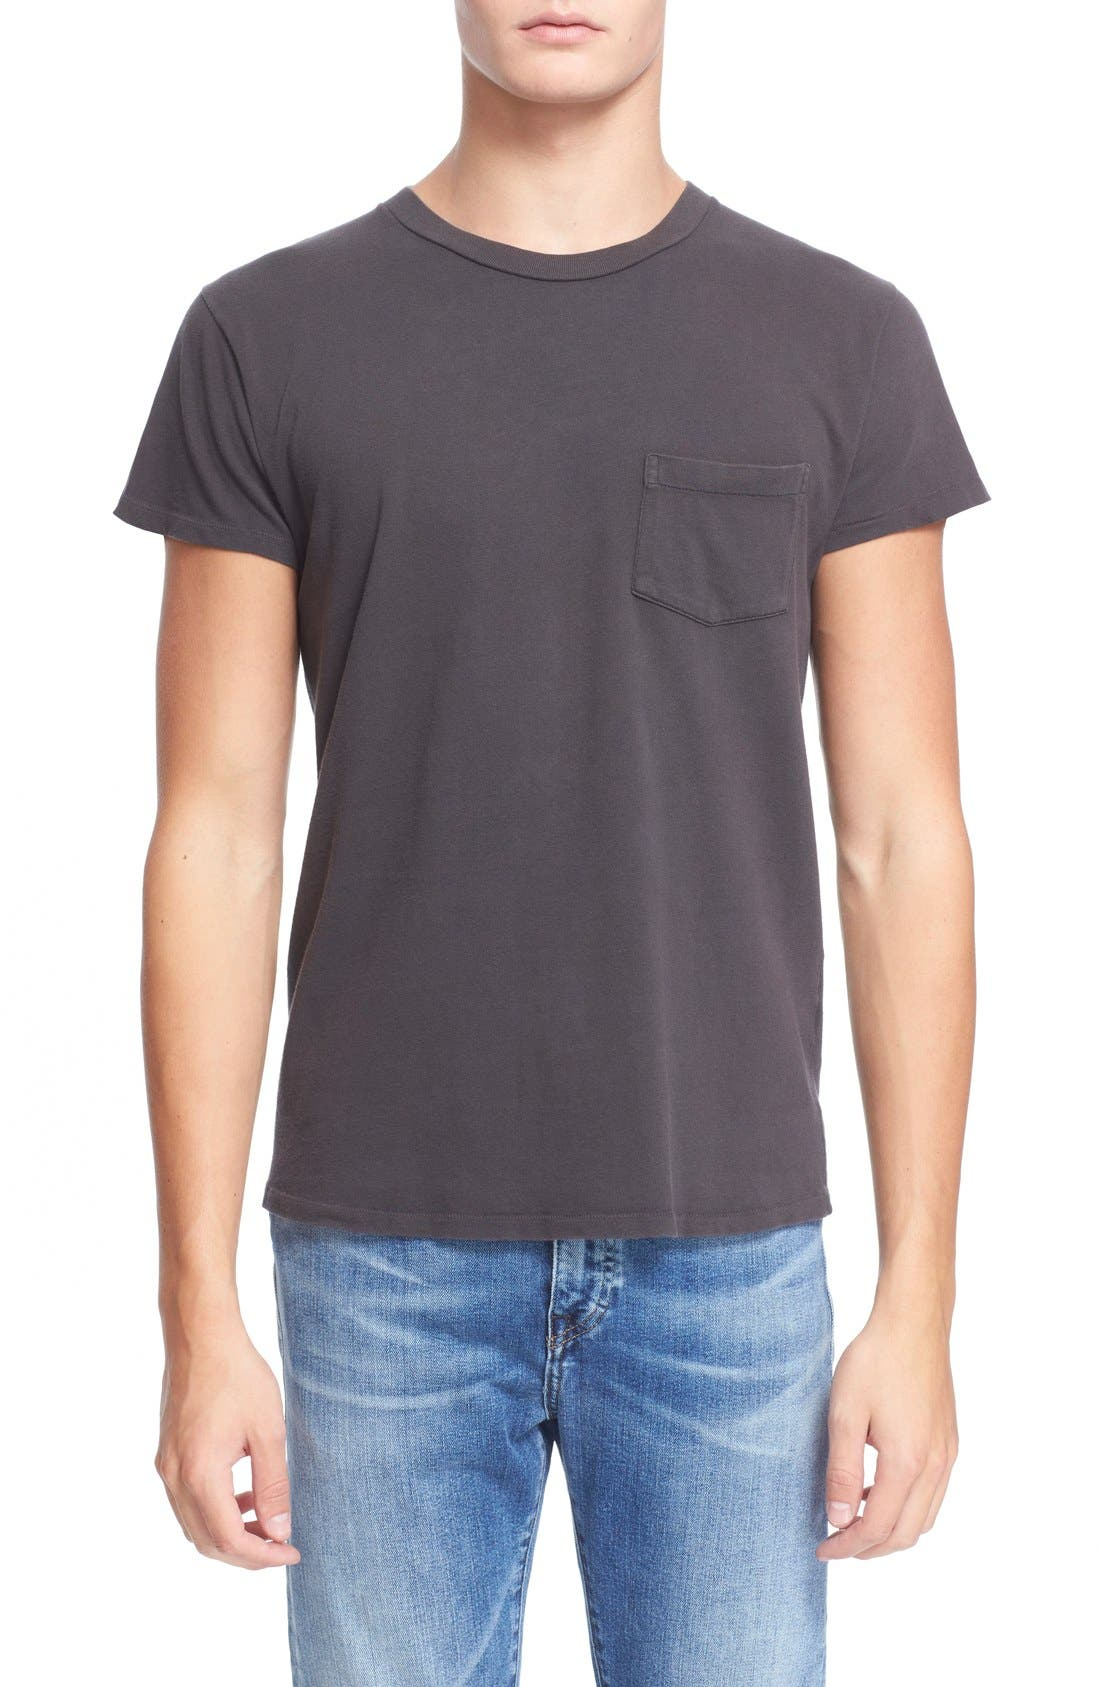 Main Image - Levi's Vintage Clothing '1950s' Pocket T-Shirt